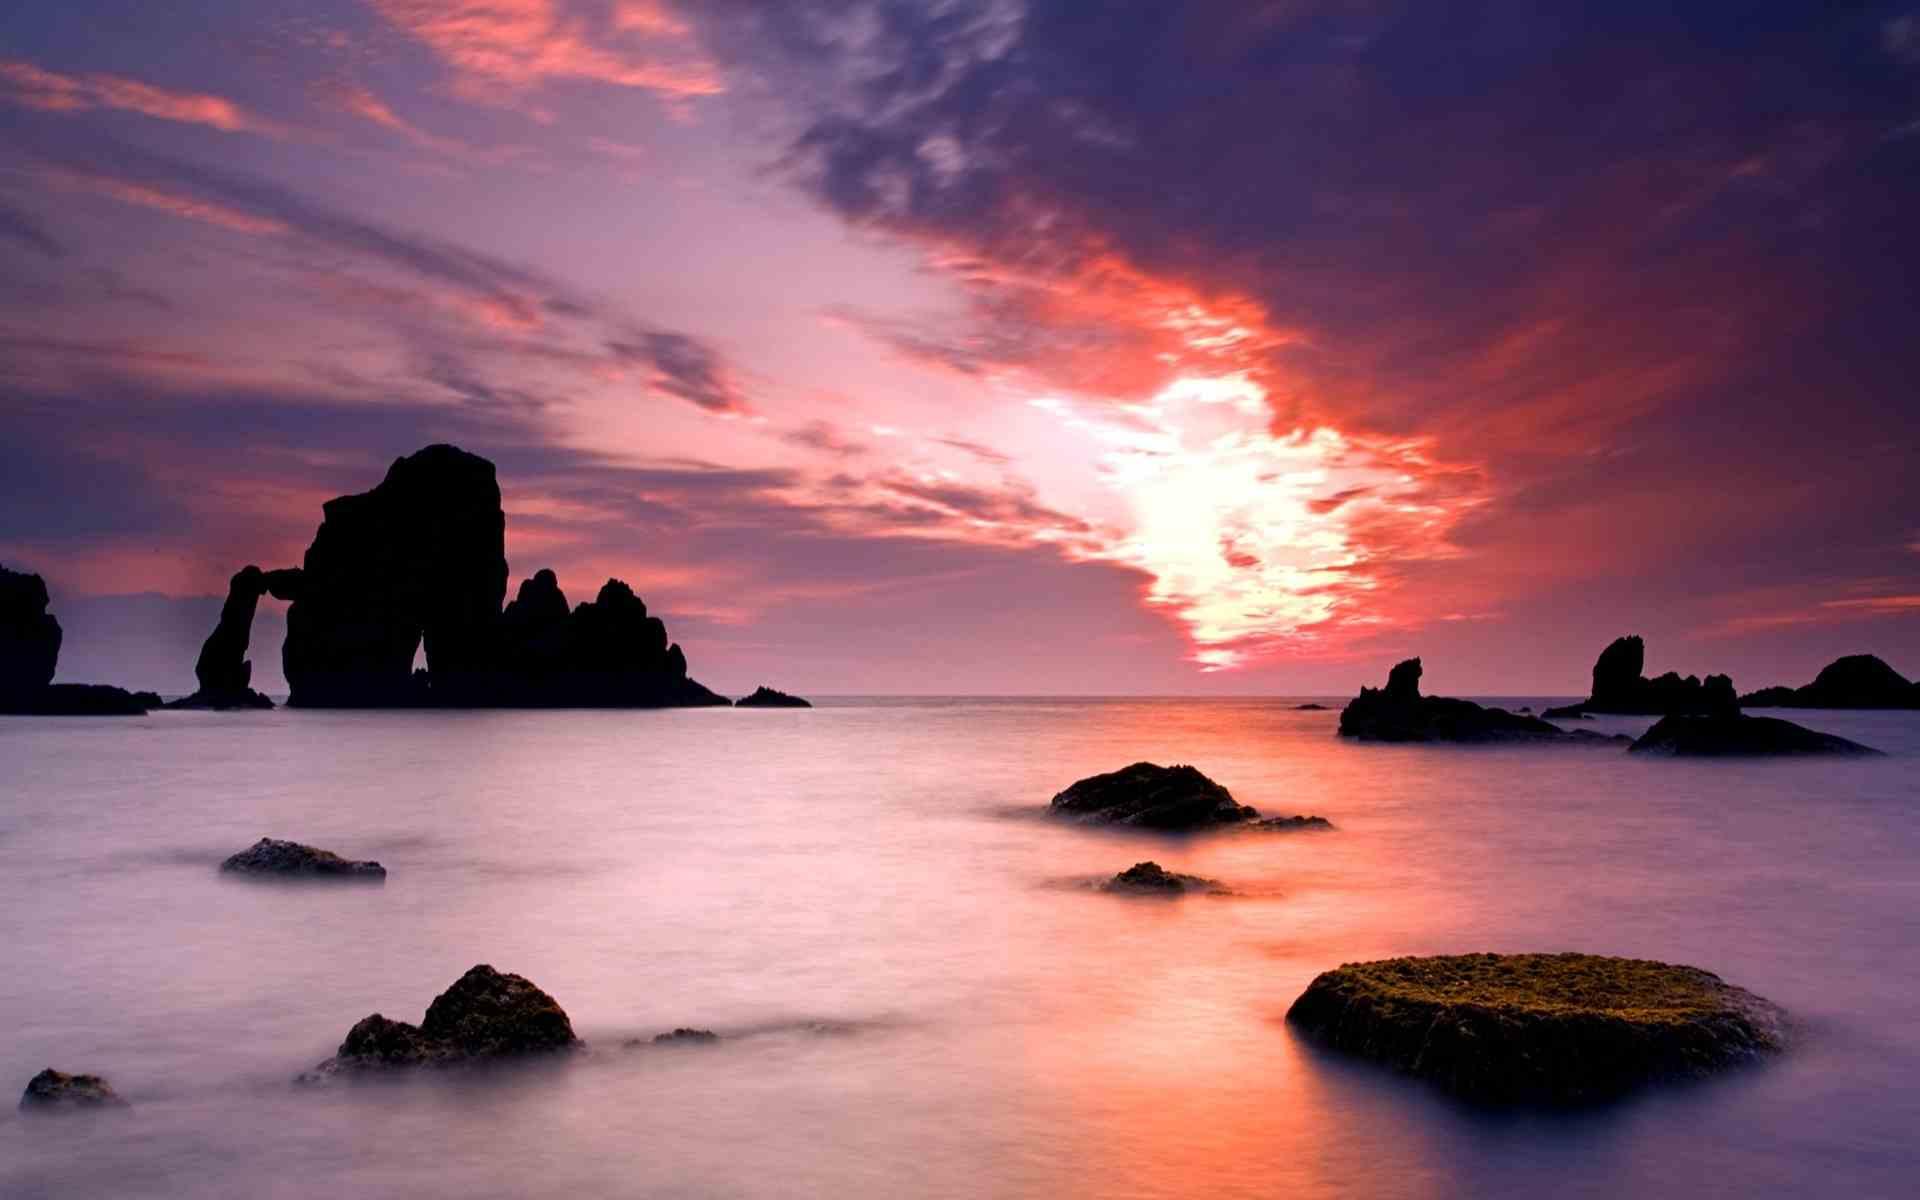 Pink Sunset Wallpaper Hd Wallpapersafari